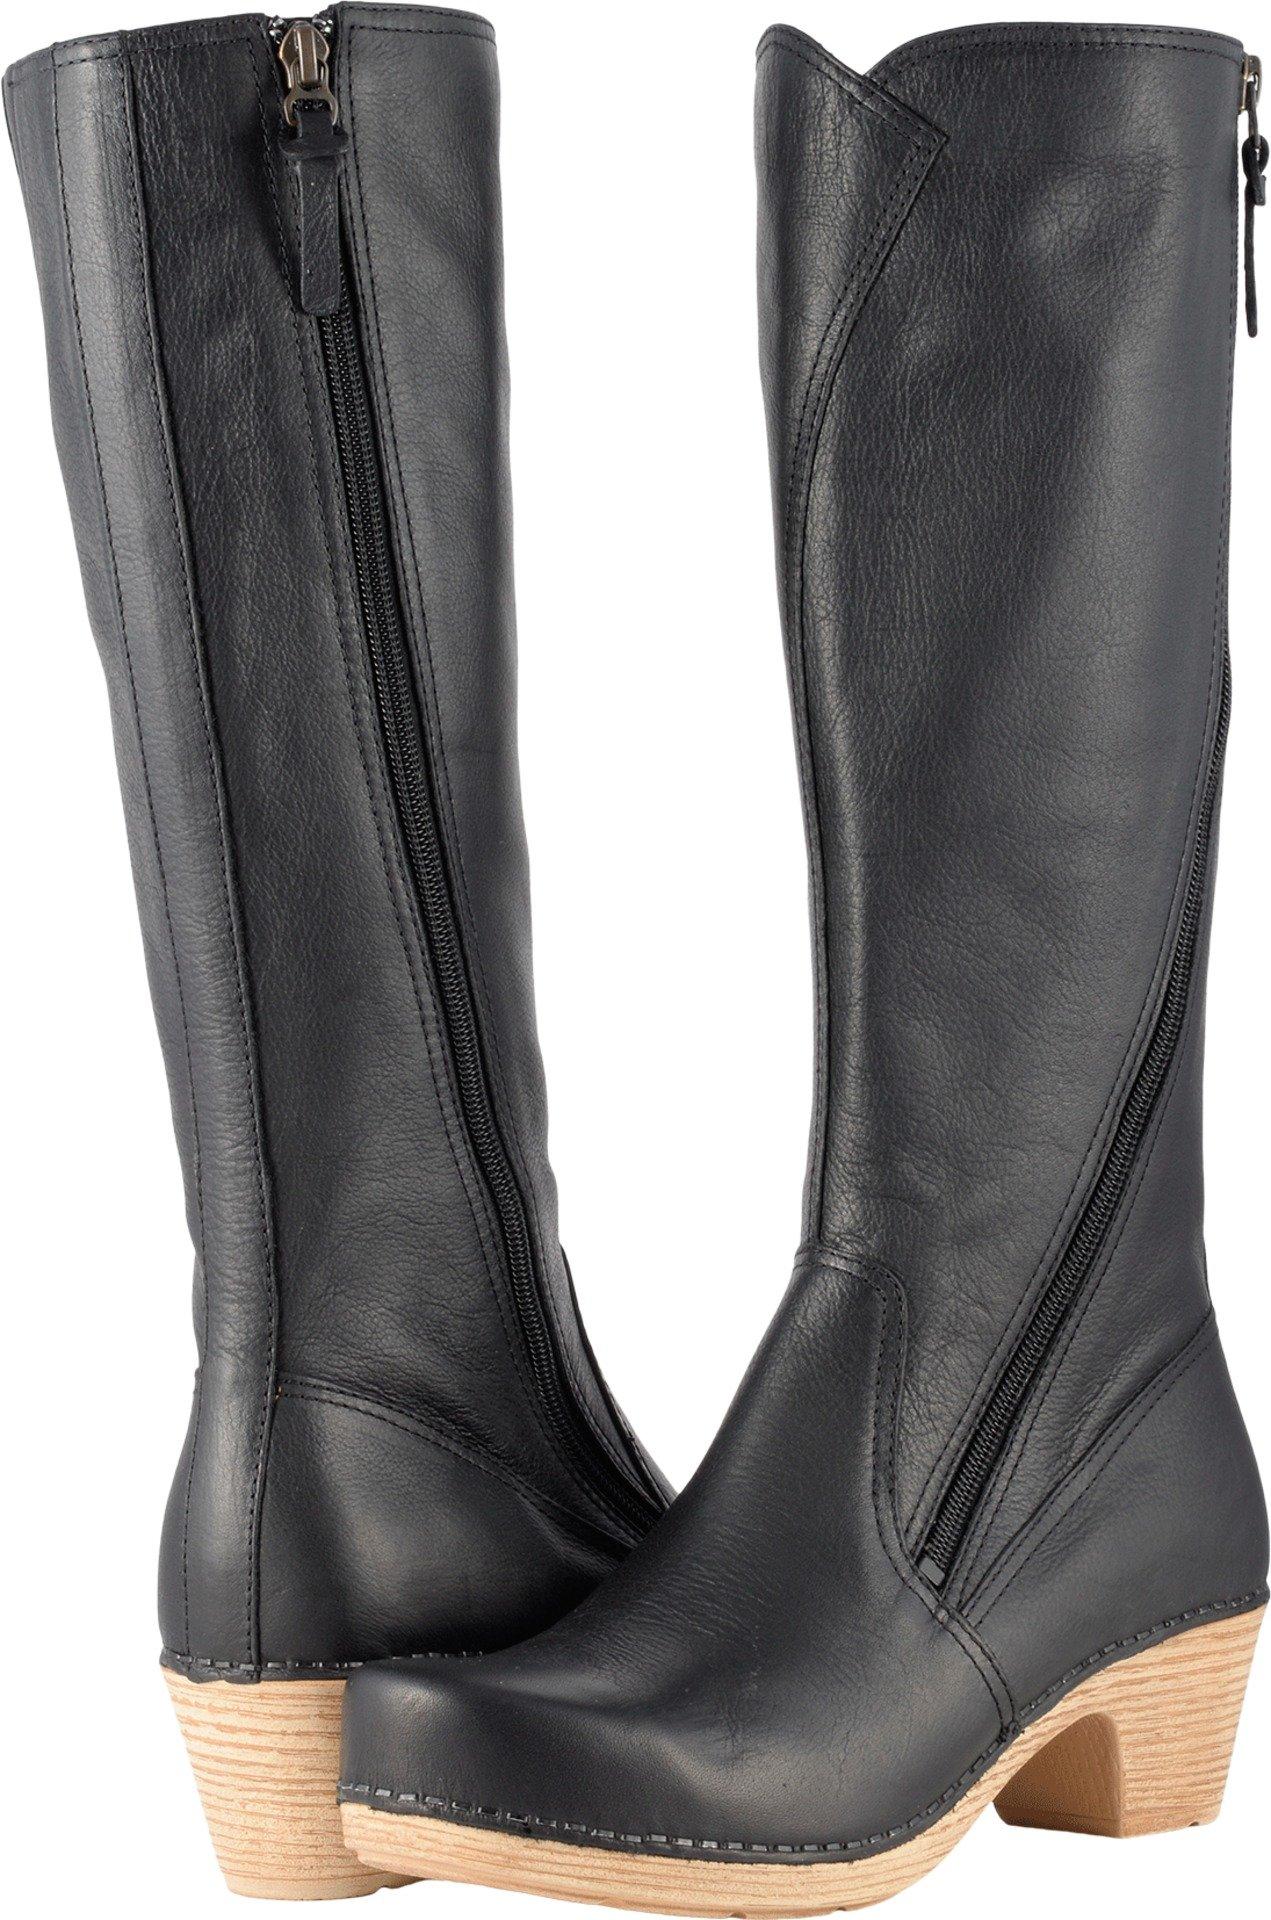 Dansko Women's Martha Boot, Black Tumbled Pull up, 36 EU/5.5-6 M US